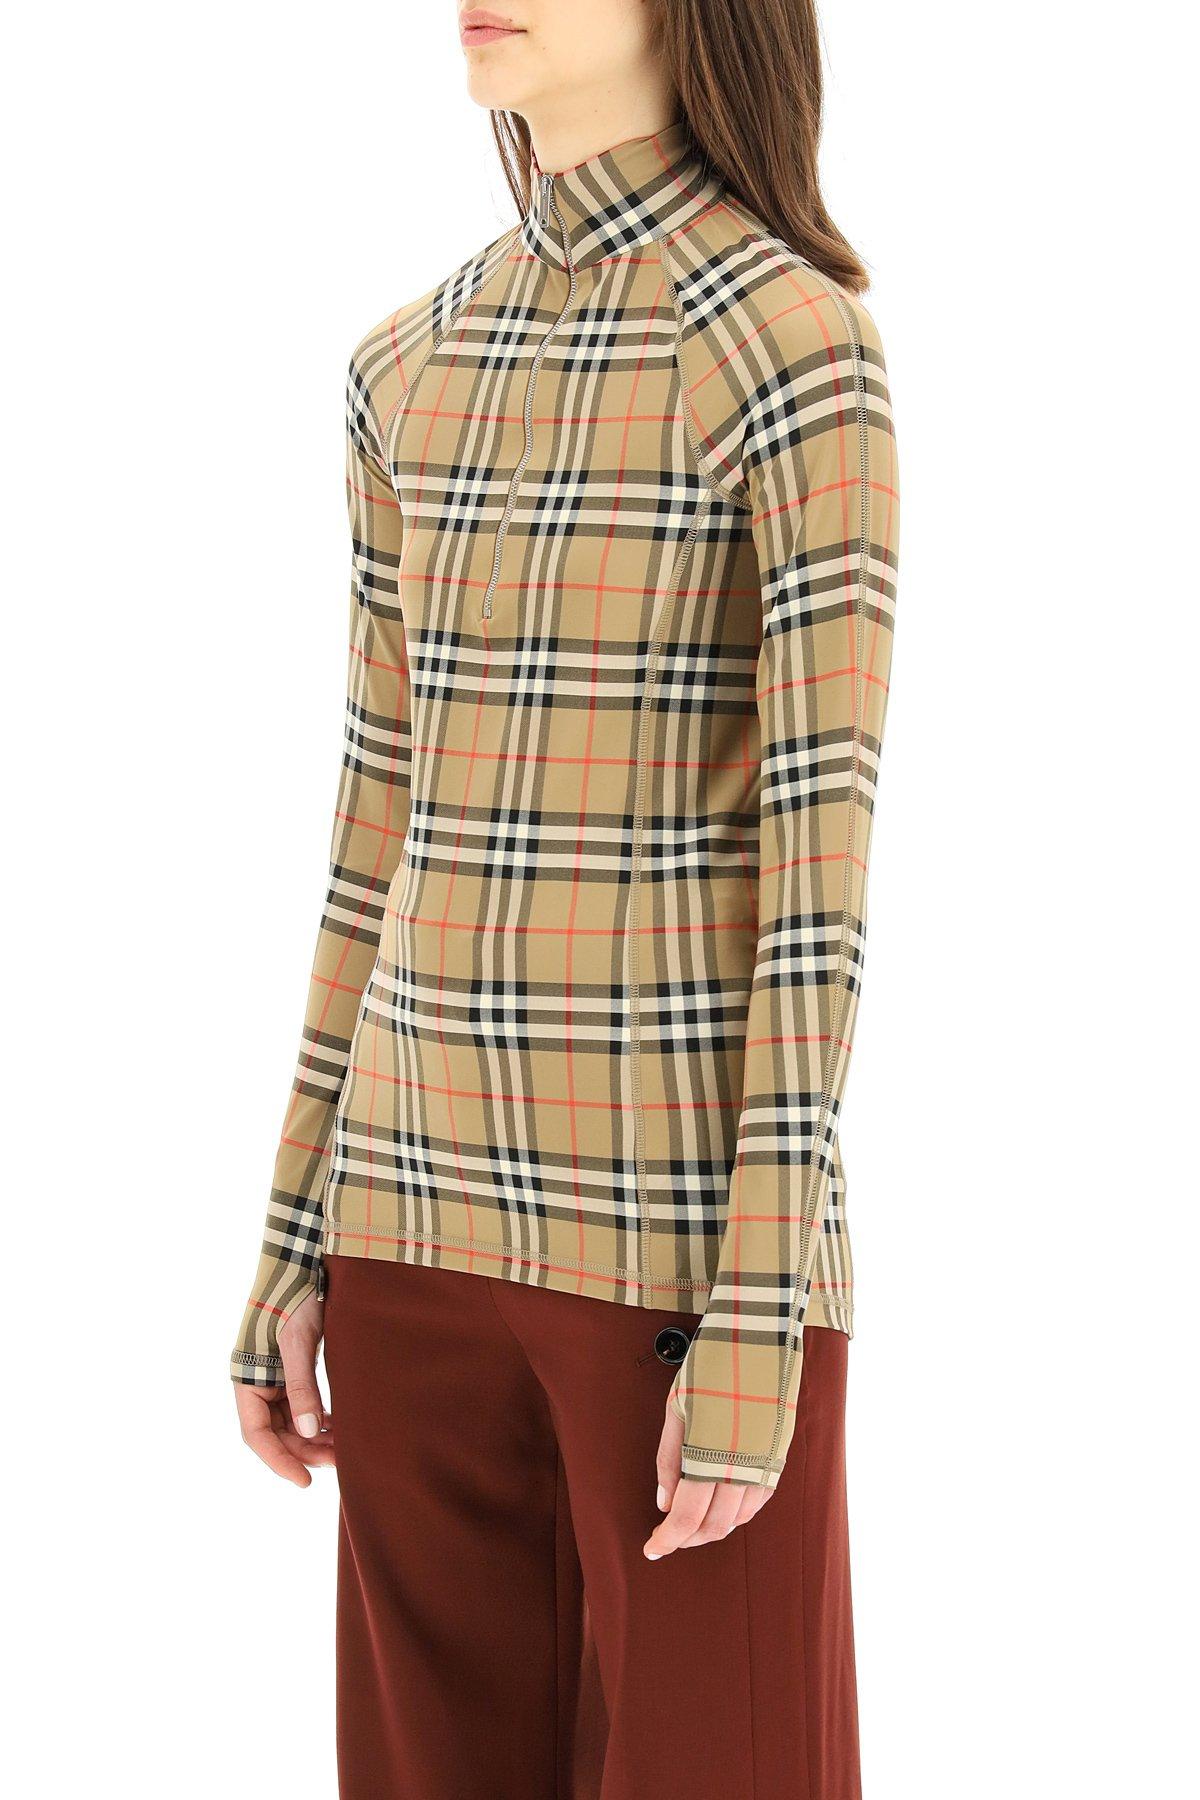 Burberry dolcevita vilan in jersey tartan check